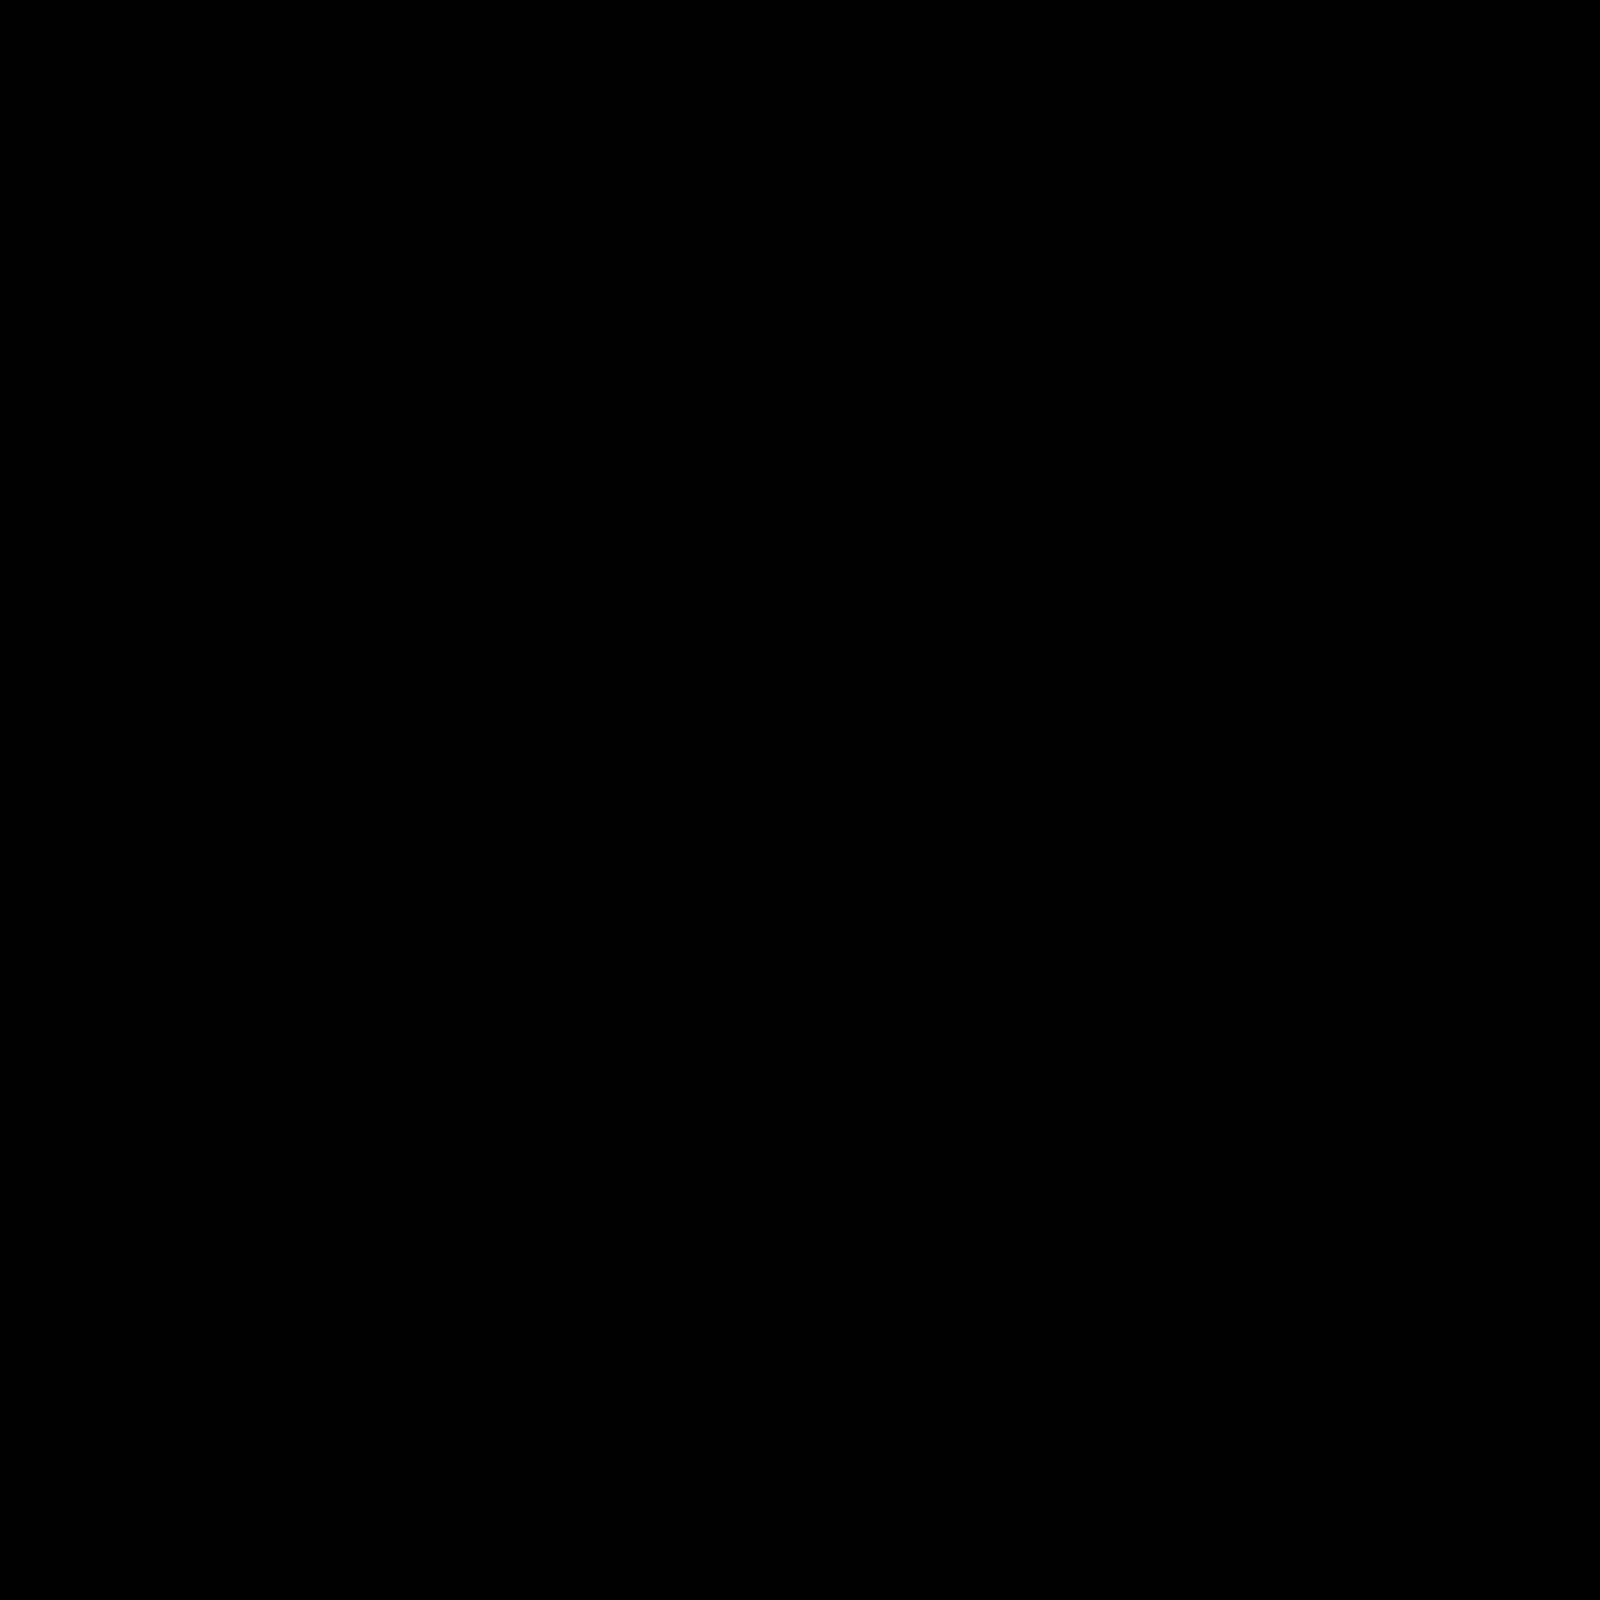 vector transparent download Computer mouse arrow clipart. Pointer cursor clip art